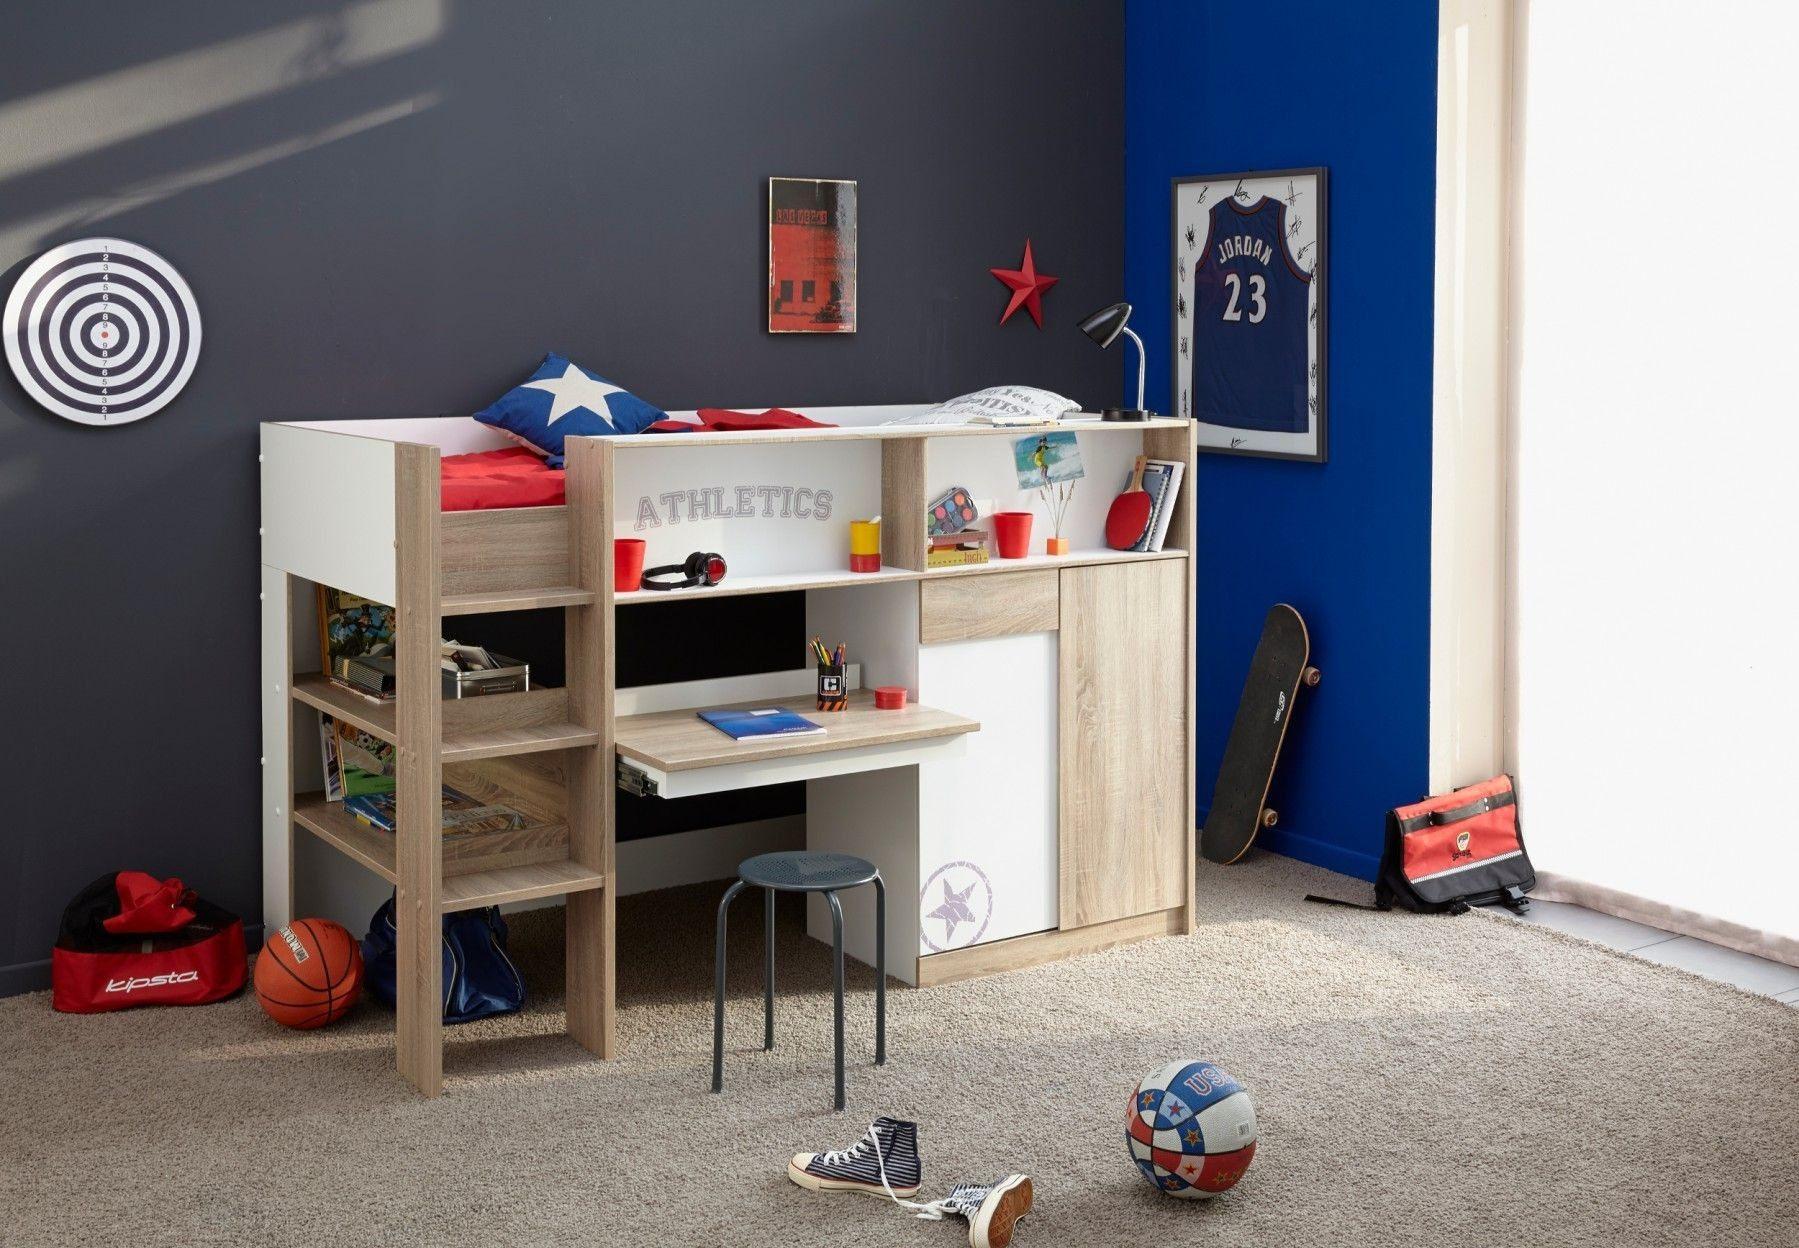 Lit Superposé Ikea 3 Places Agréable Délicieux Chambre Enfant Lit Superposé  Lit Superposé Avec Bureau